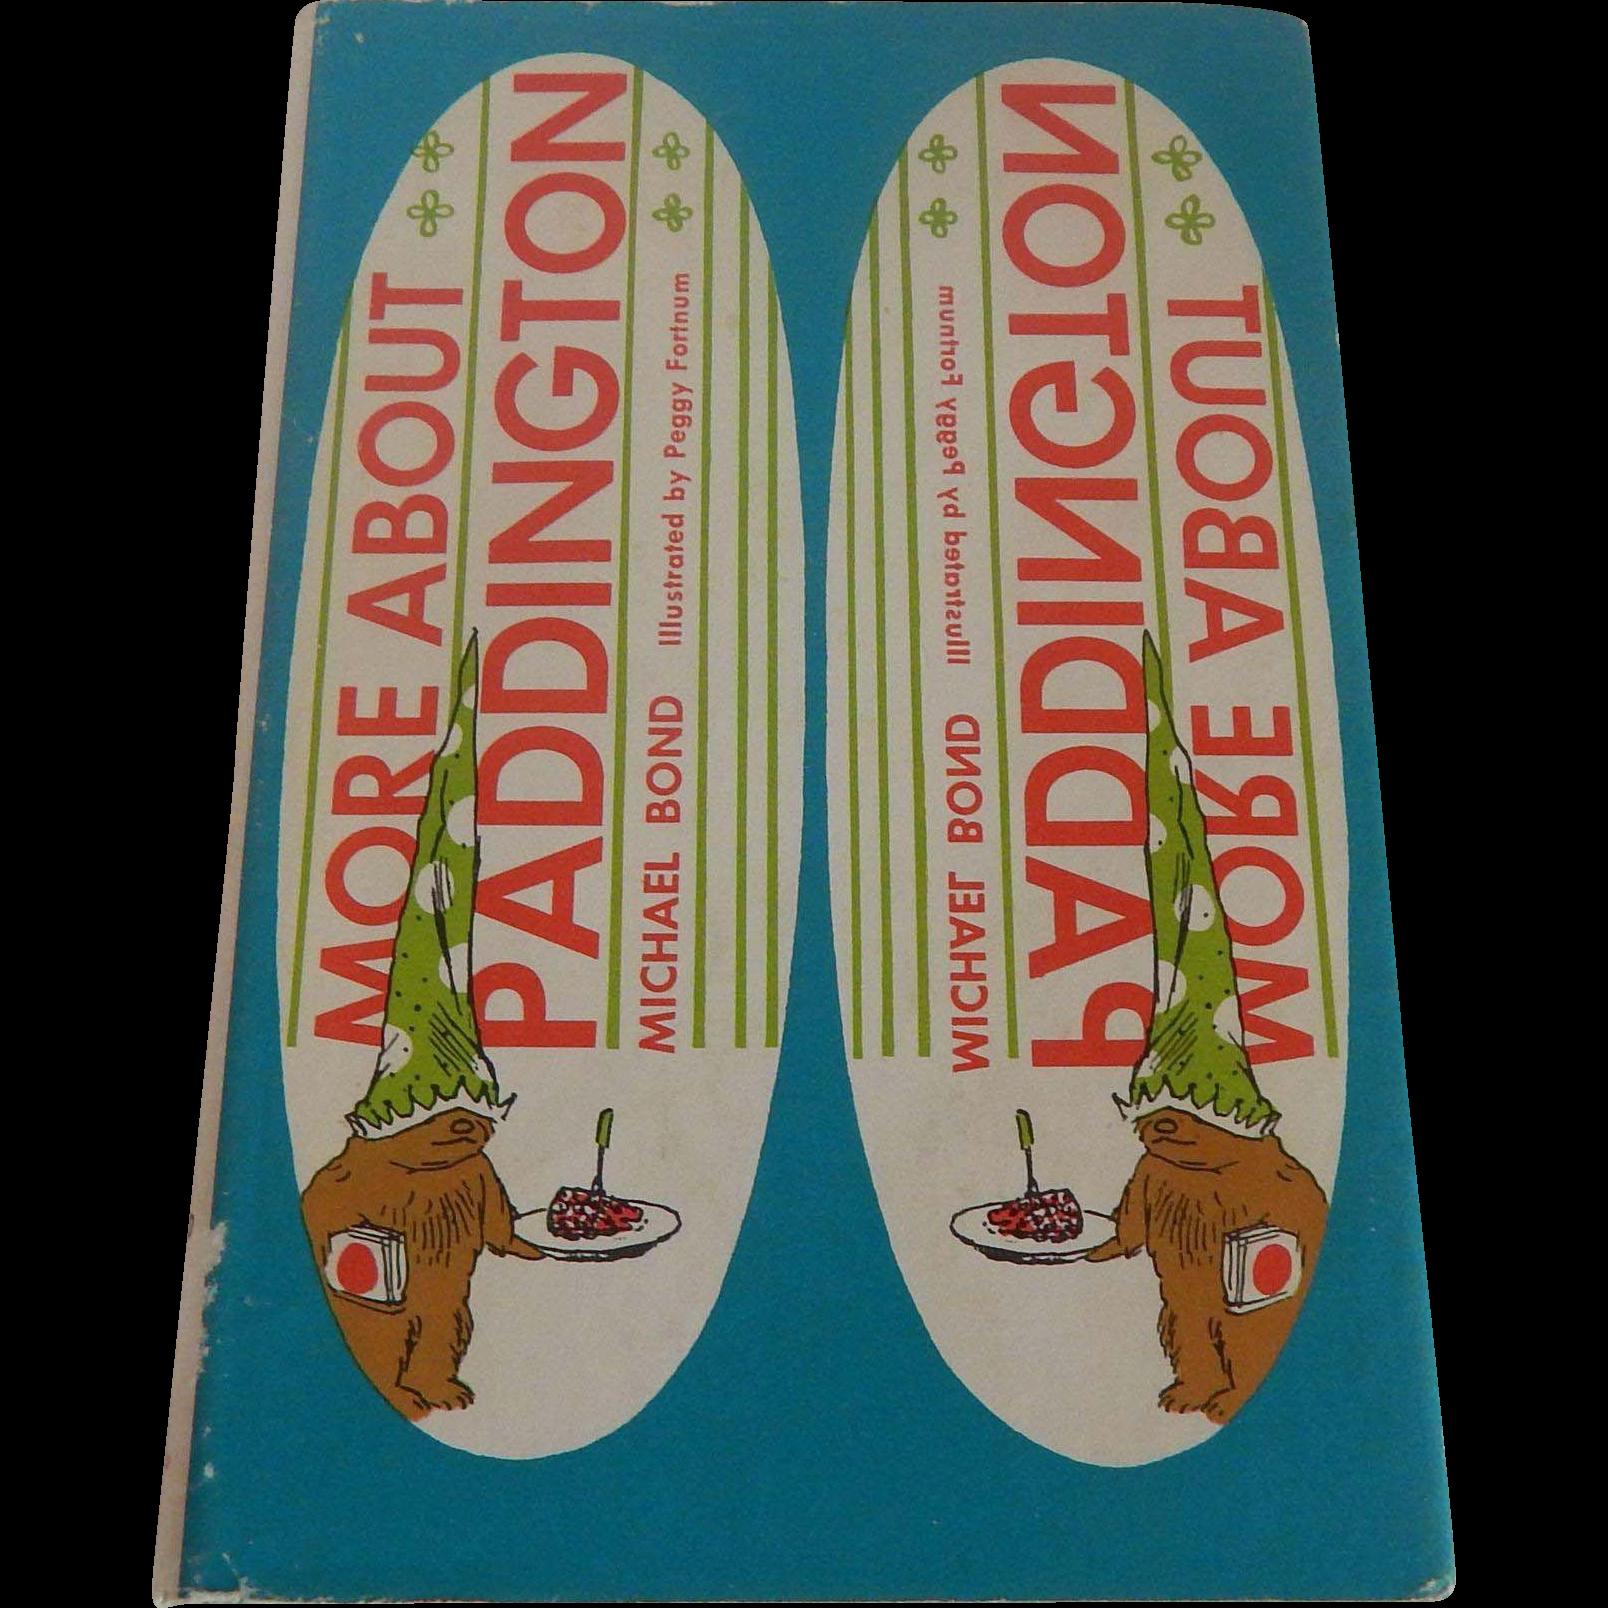 More About Paddington Michael Bond